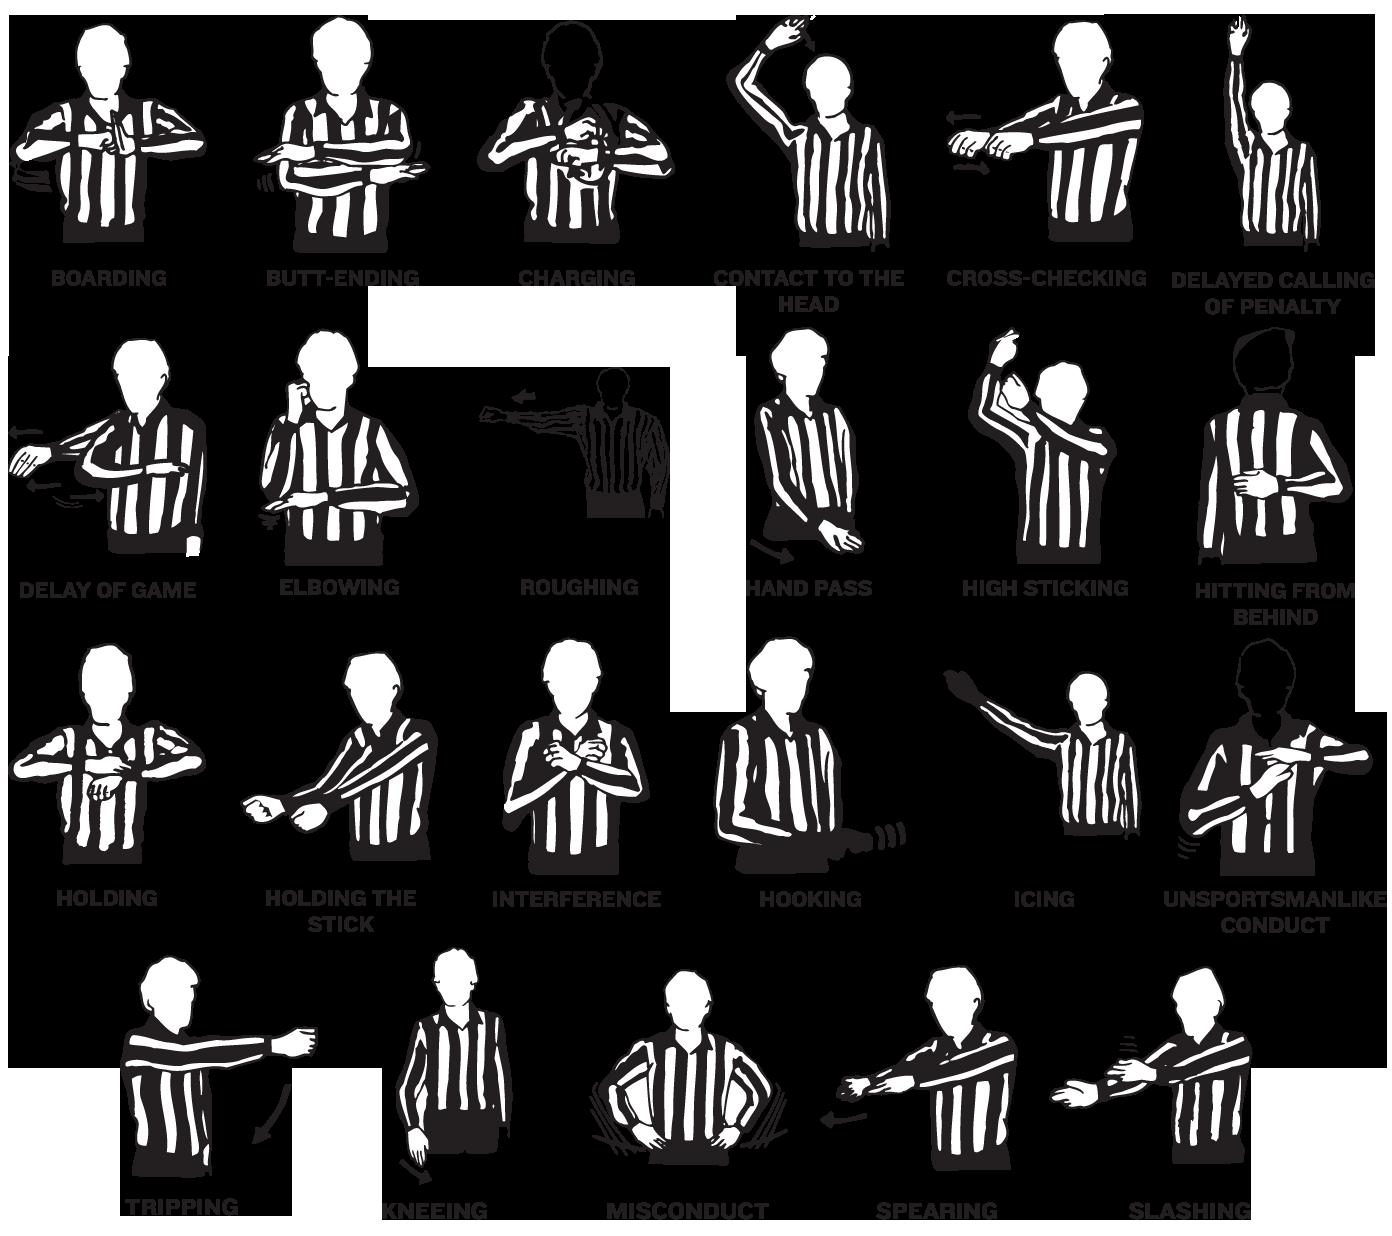 Hockey clipart ref. Basic referee penalty hand